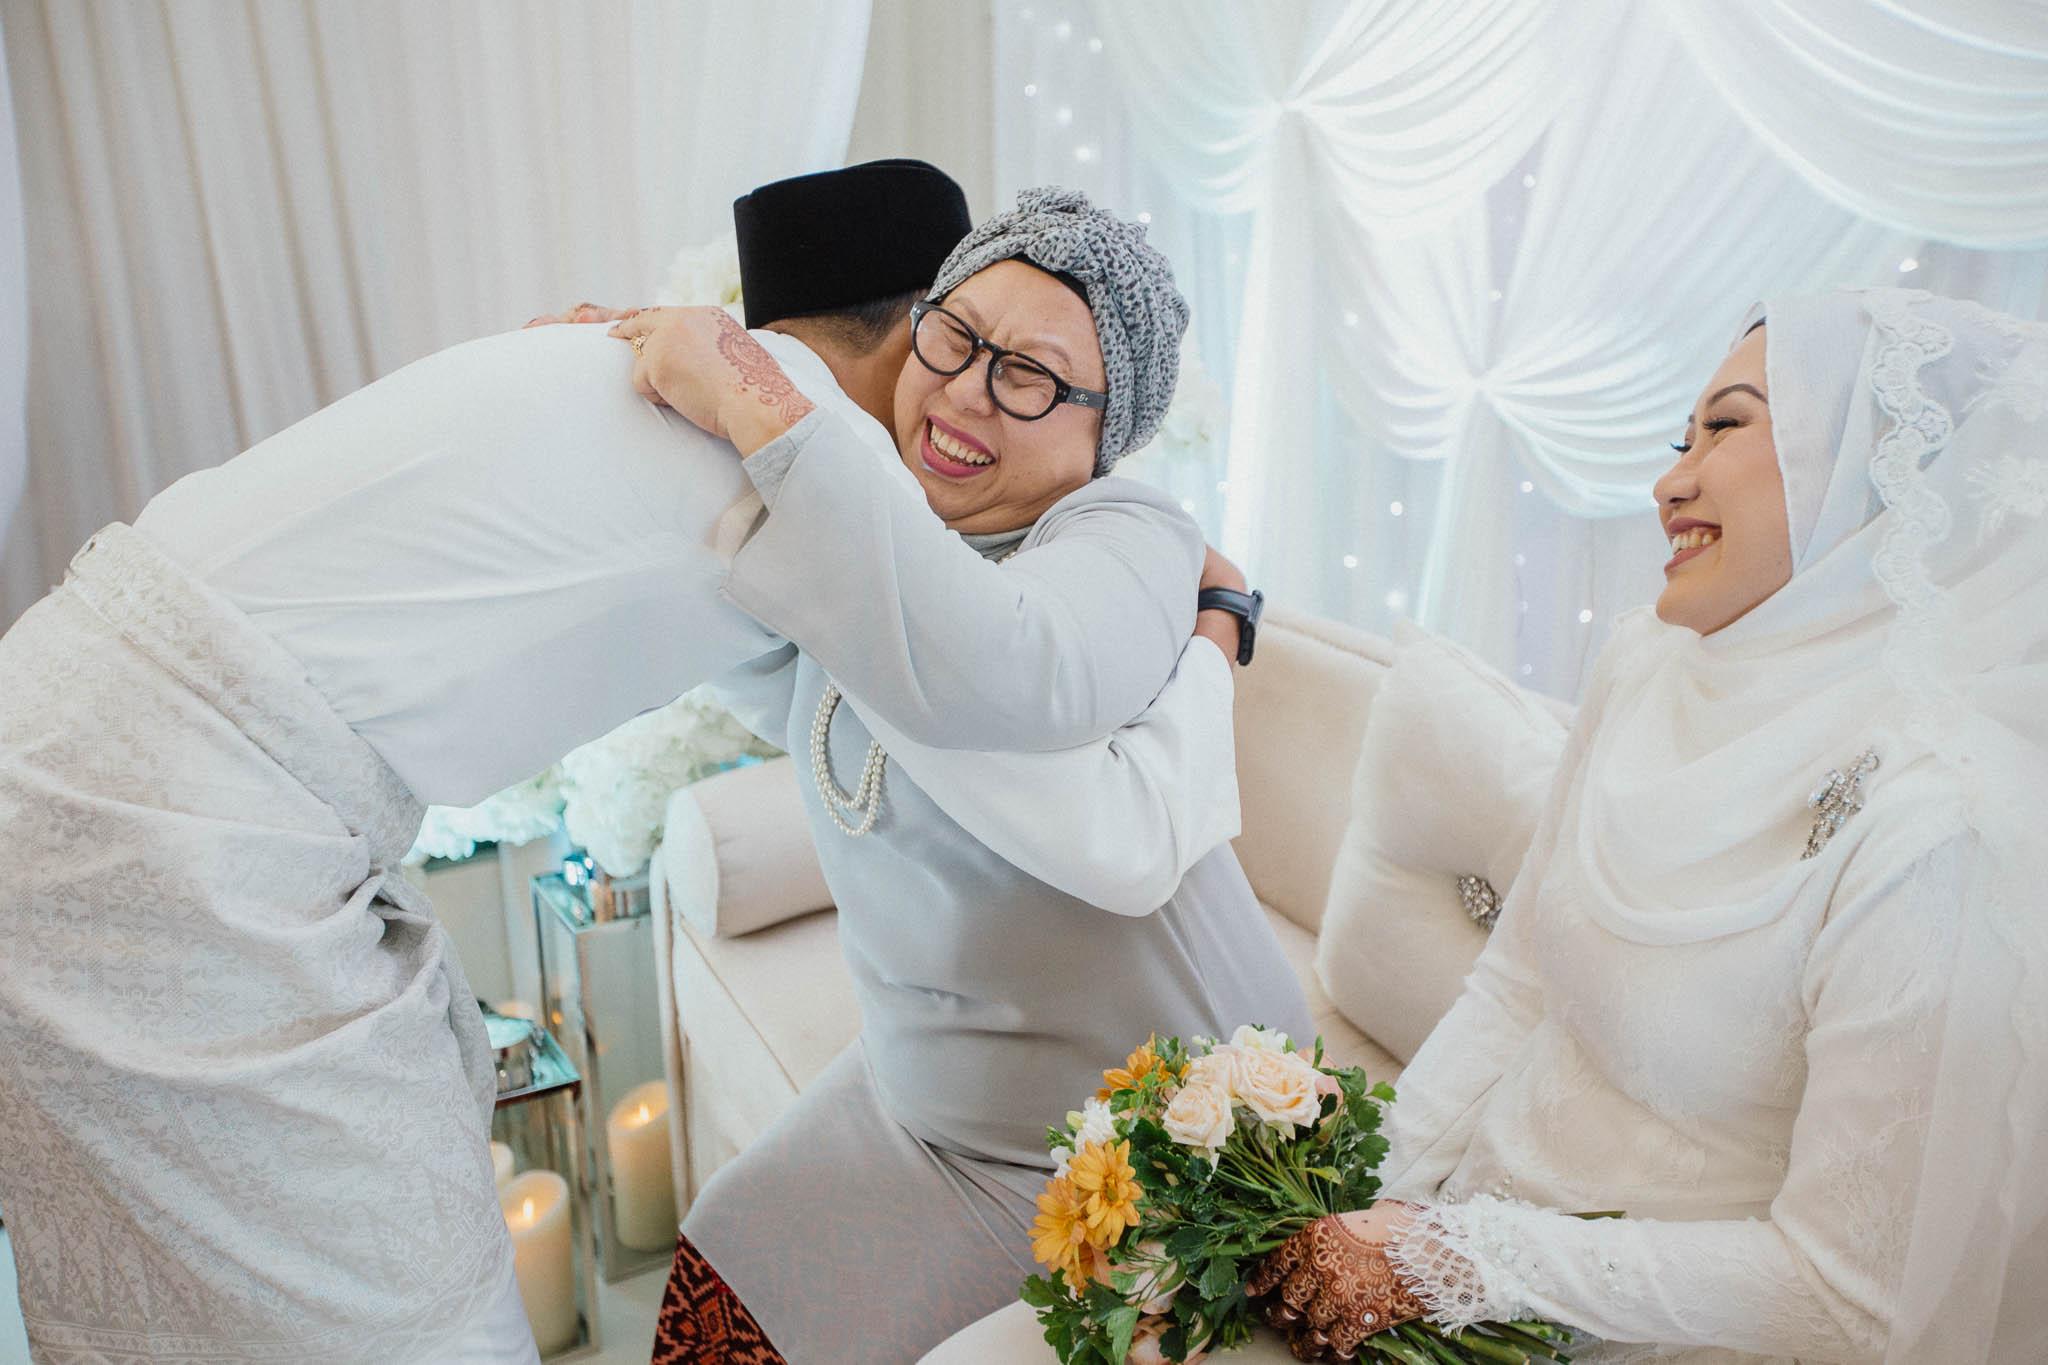 singapore-wedding-photographer-wedding-nufail-addafiq-024.jpg